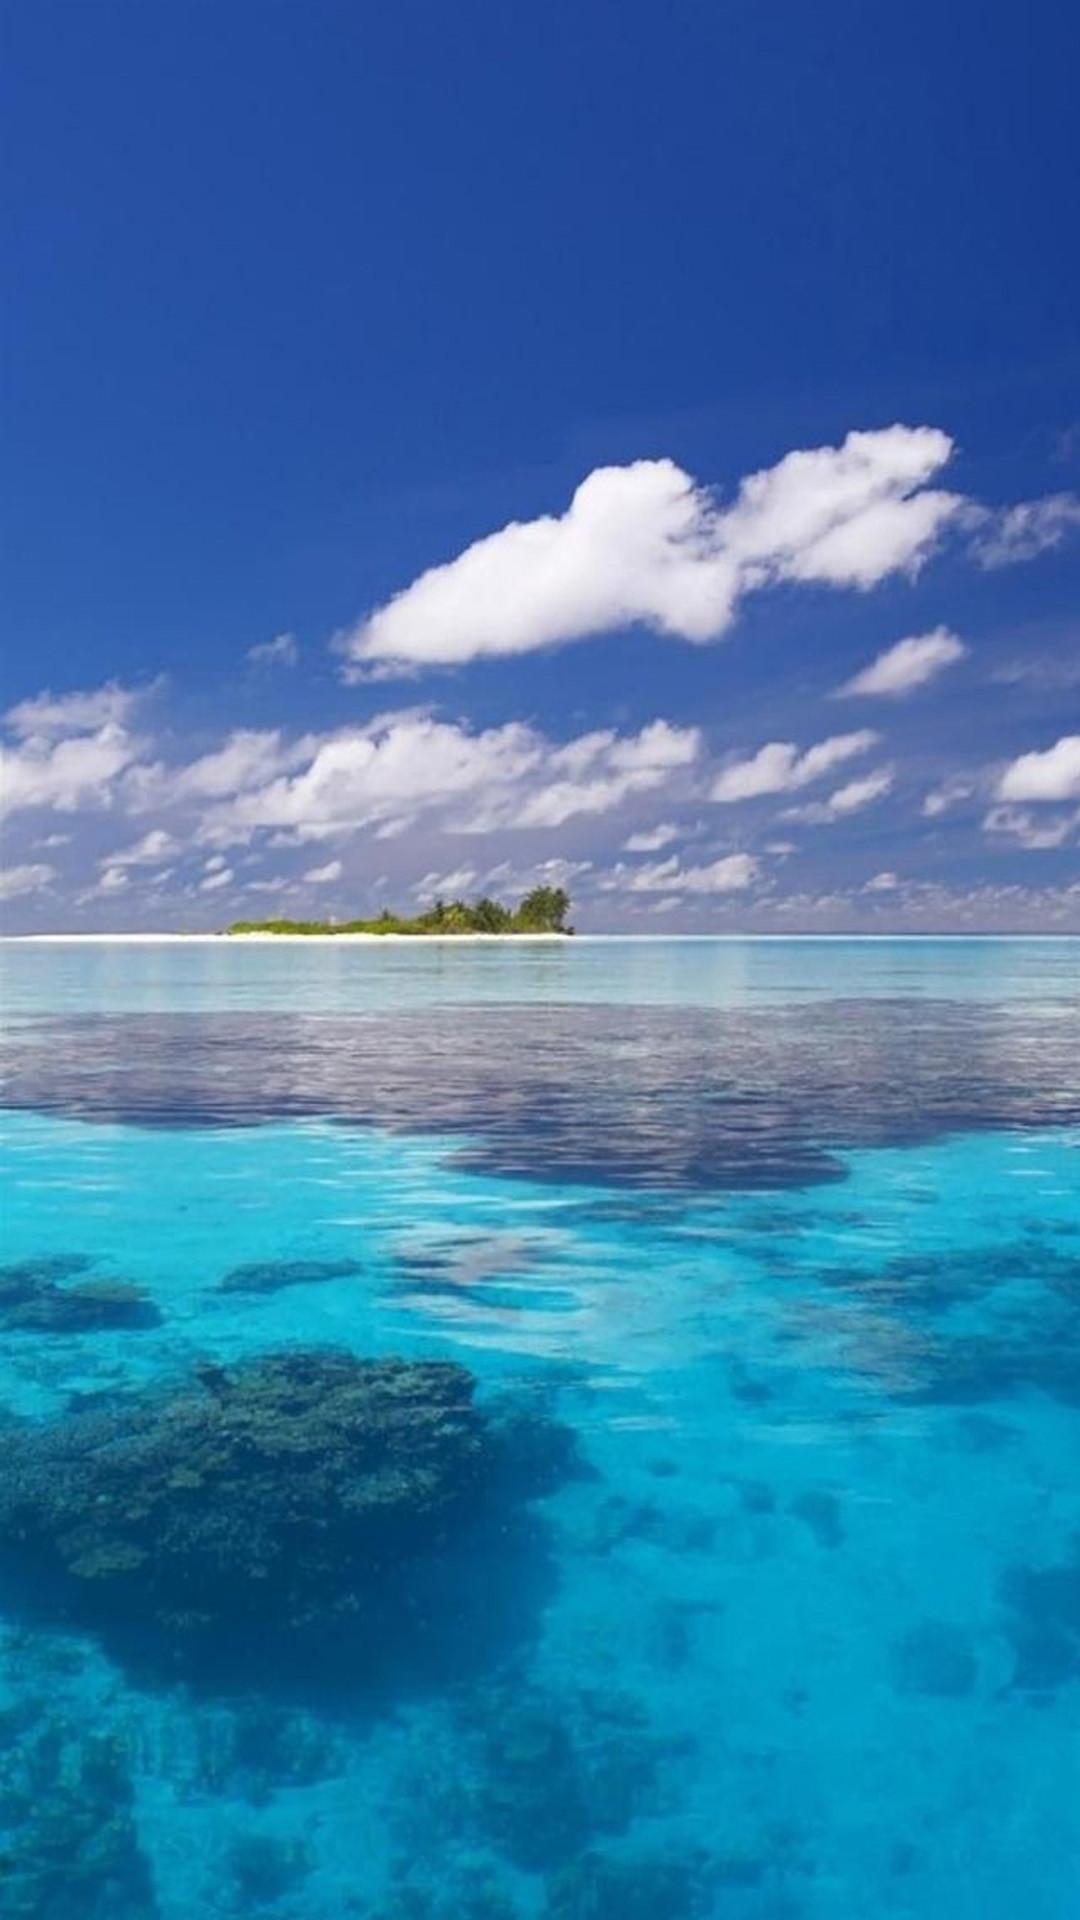 Samsung Galaxy S5 Live Wallpaper Wallpapersafari - Crystal Clear Barbados Water - HD Wallpaper